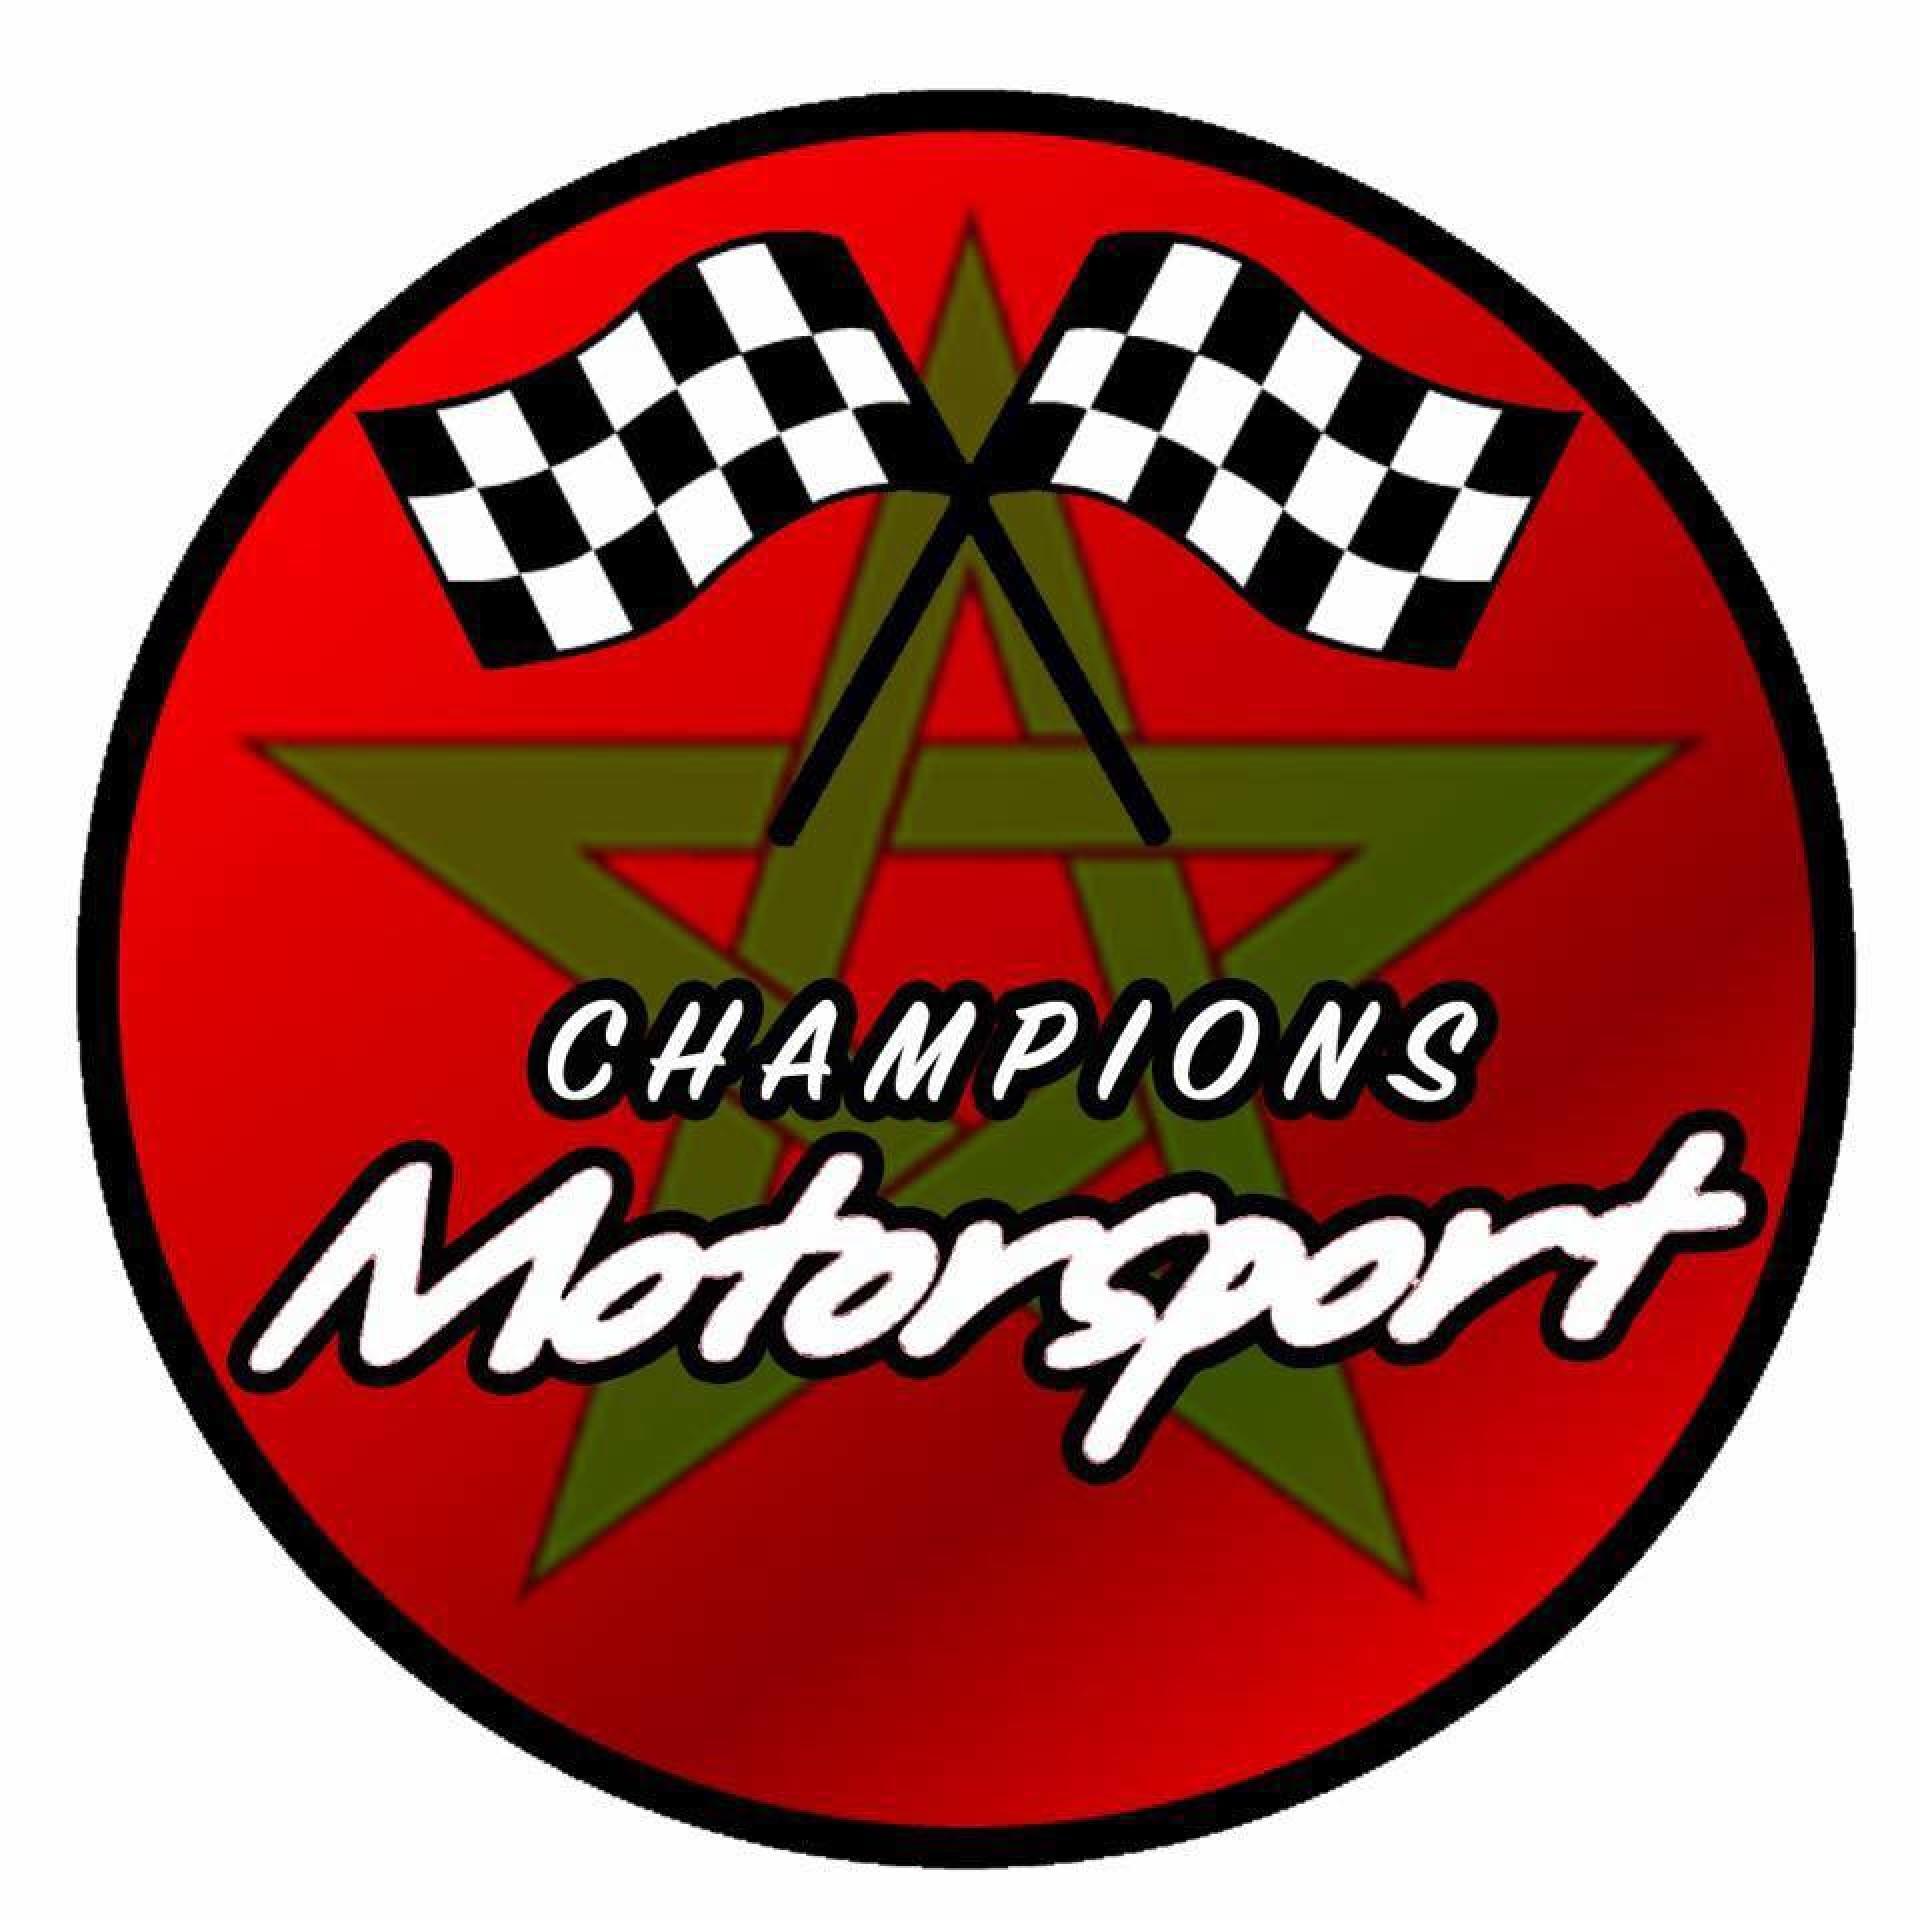 Association Sportive Champions Motor Sports (ASCMS) logo